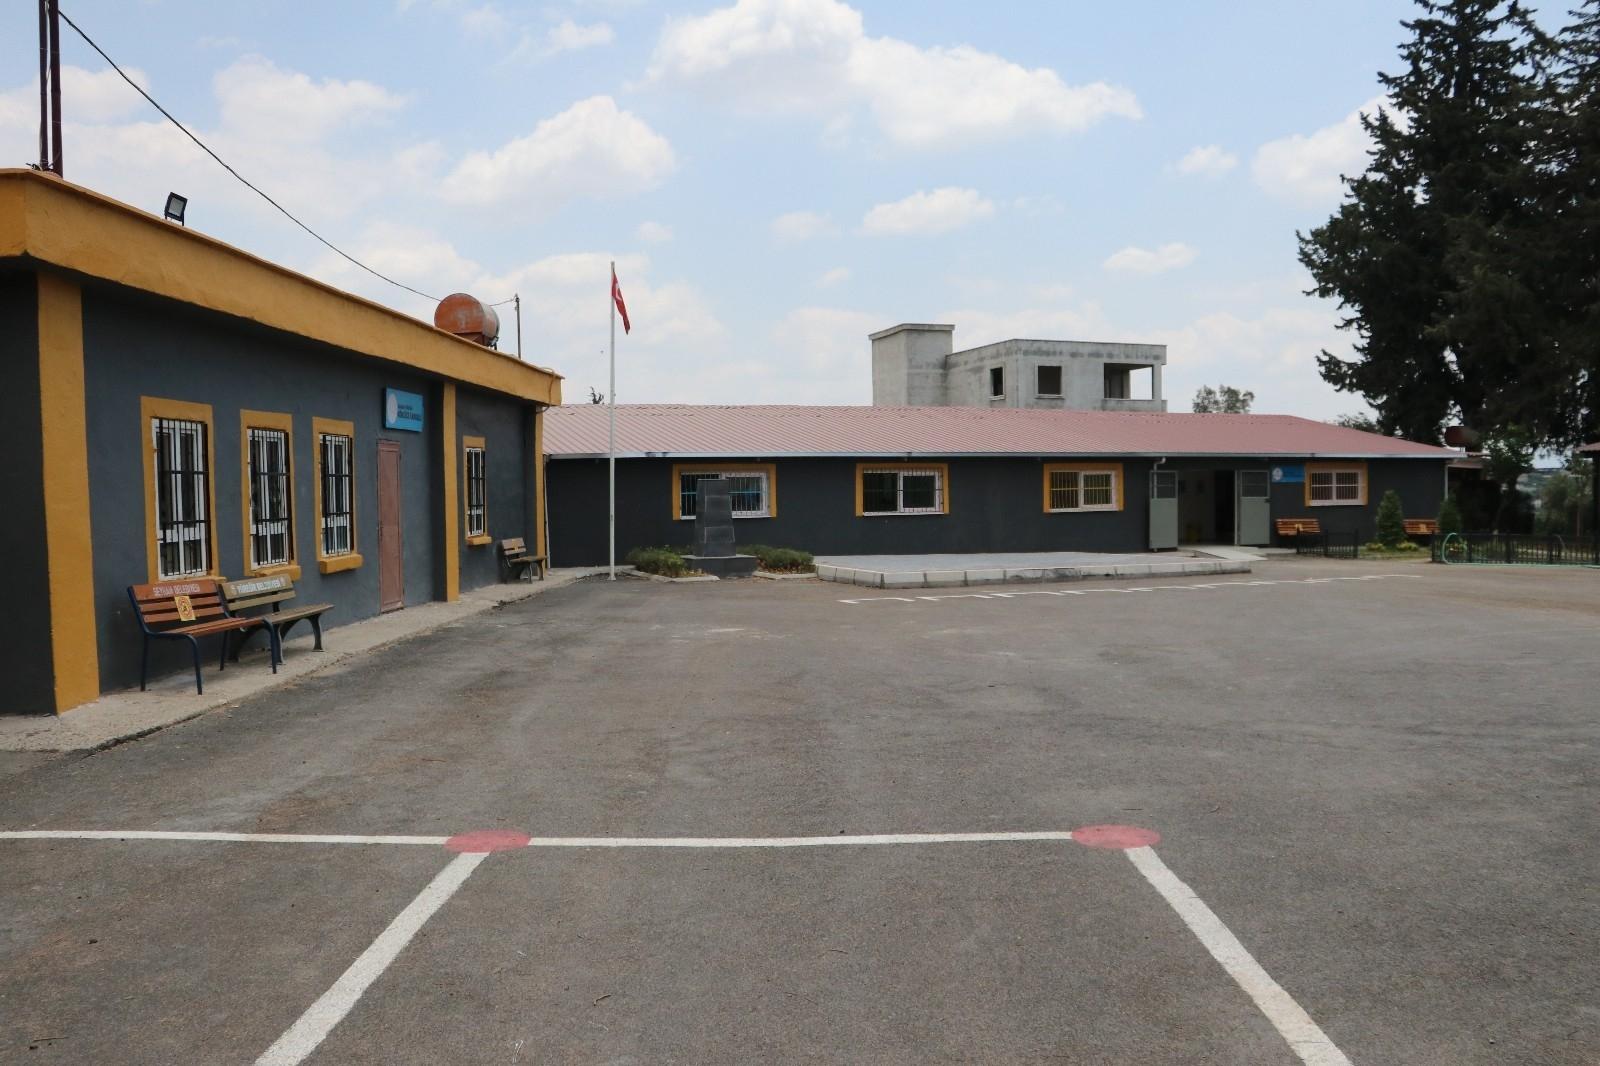 2021/06/okul-mudiresi-atandigi-harabe-koy-okuluna-adeta-hayat-verdi-20210610AW34-16.jpg